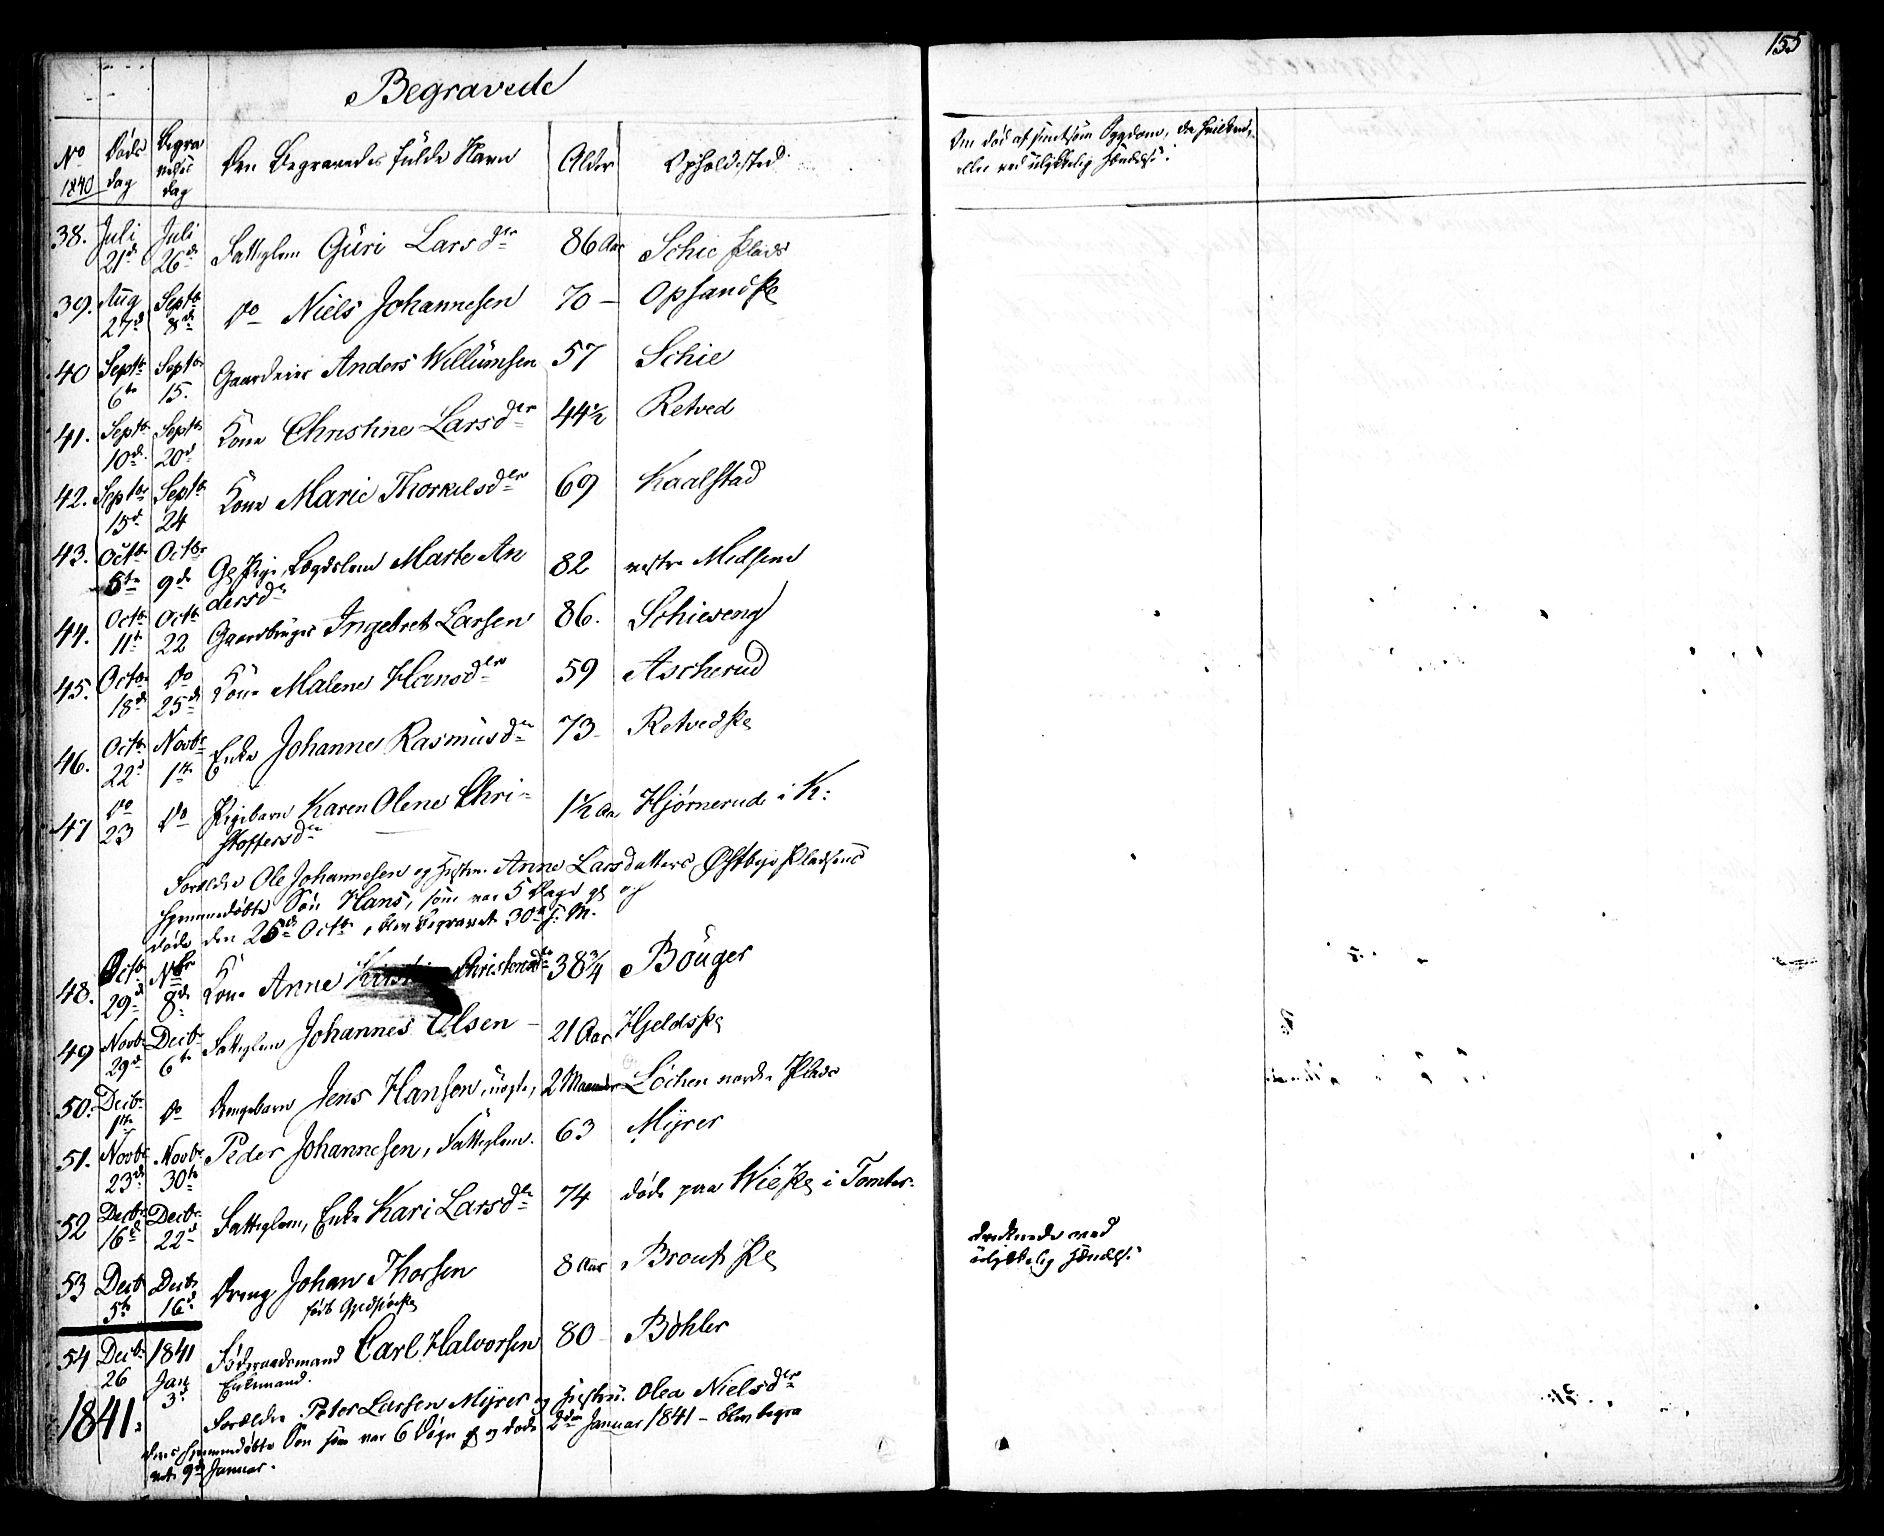 SAO, Kråkstad prestekontor Kirkebøker, F/Fa/L0005: Ministerialbok nr. I 5, 1837-1847, s. 155